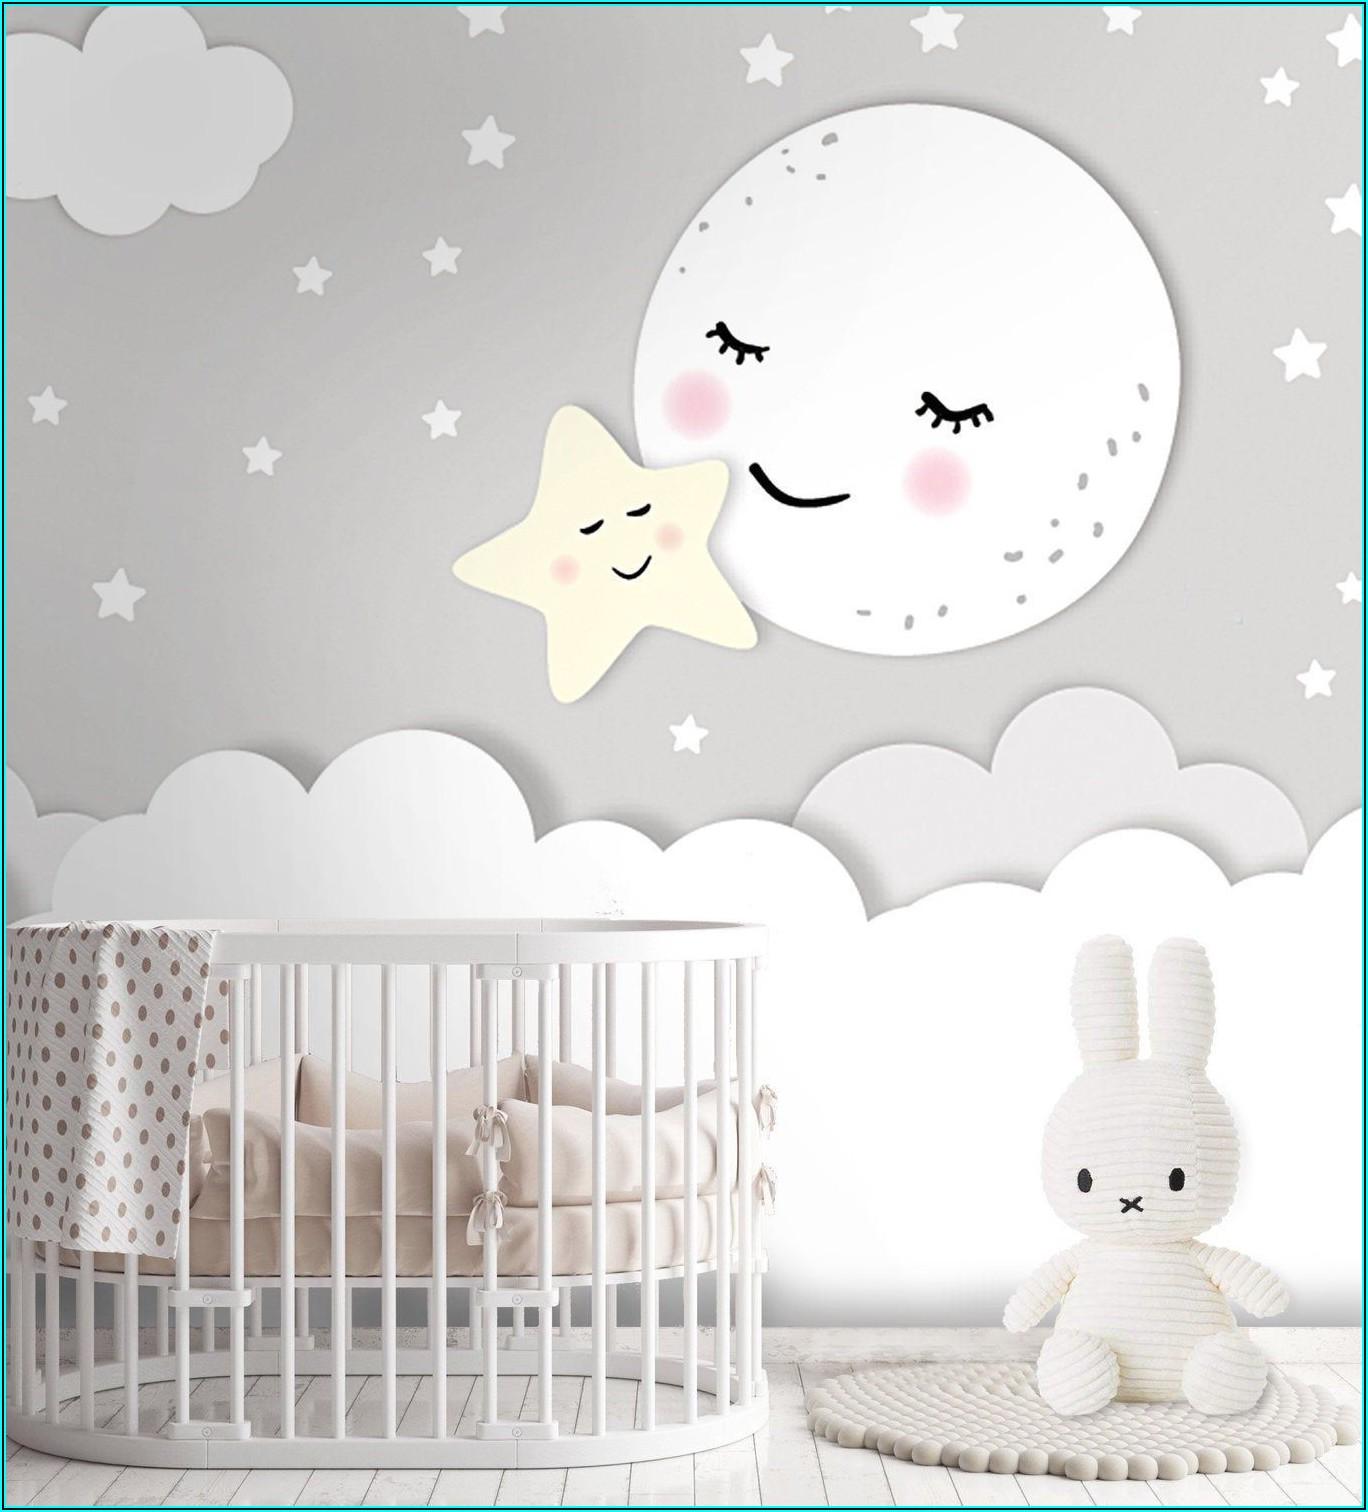 Tapete Babyzimmer Sterne